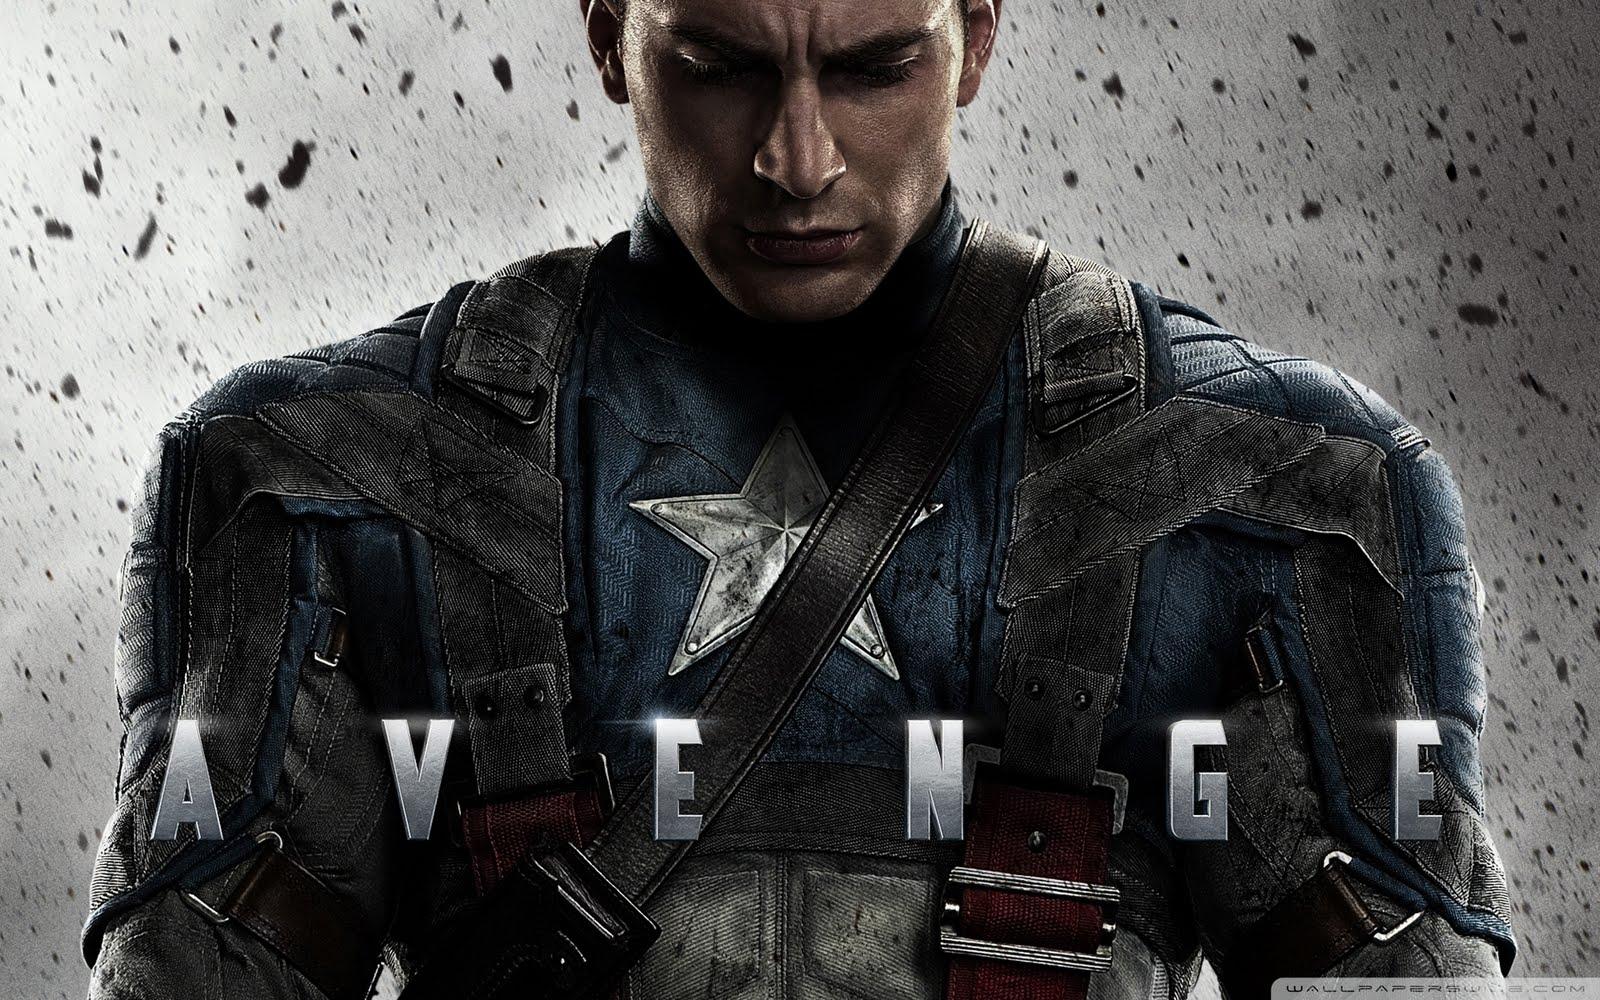 http://2.bp.blogspot.com/-dvx4NV0eNdg/TqElKgs6mLI/AAAAAAAAAS8/B_MNI-XkiZE/s1600/captain_america_movie_2011-wallpaper.jpg